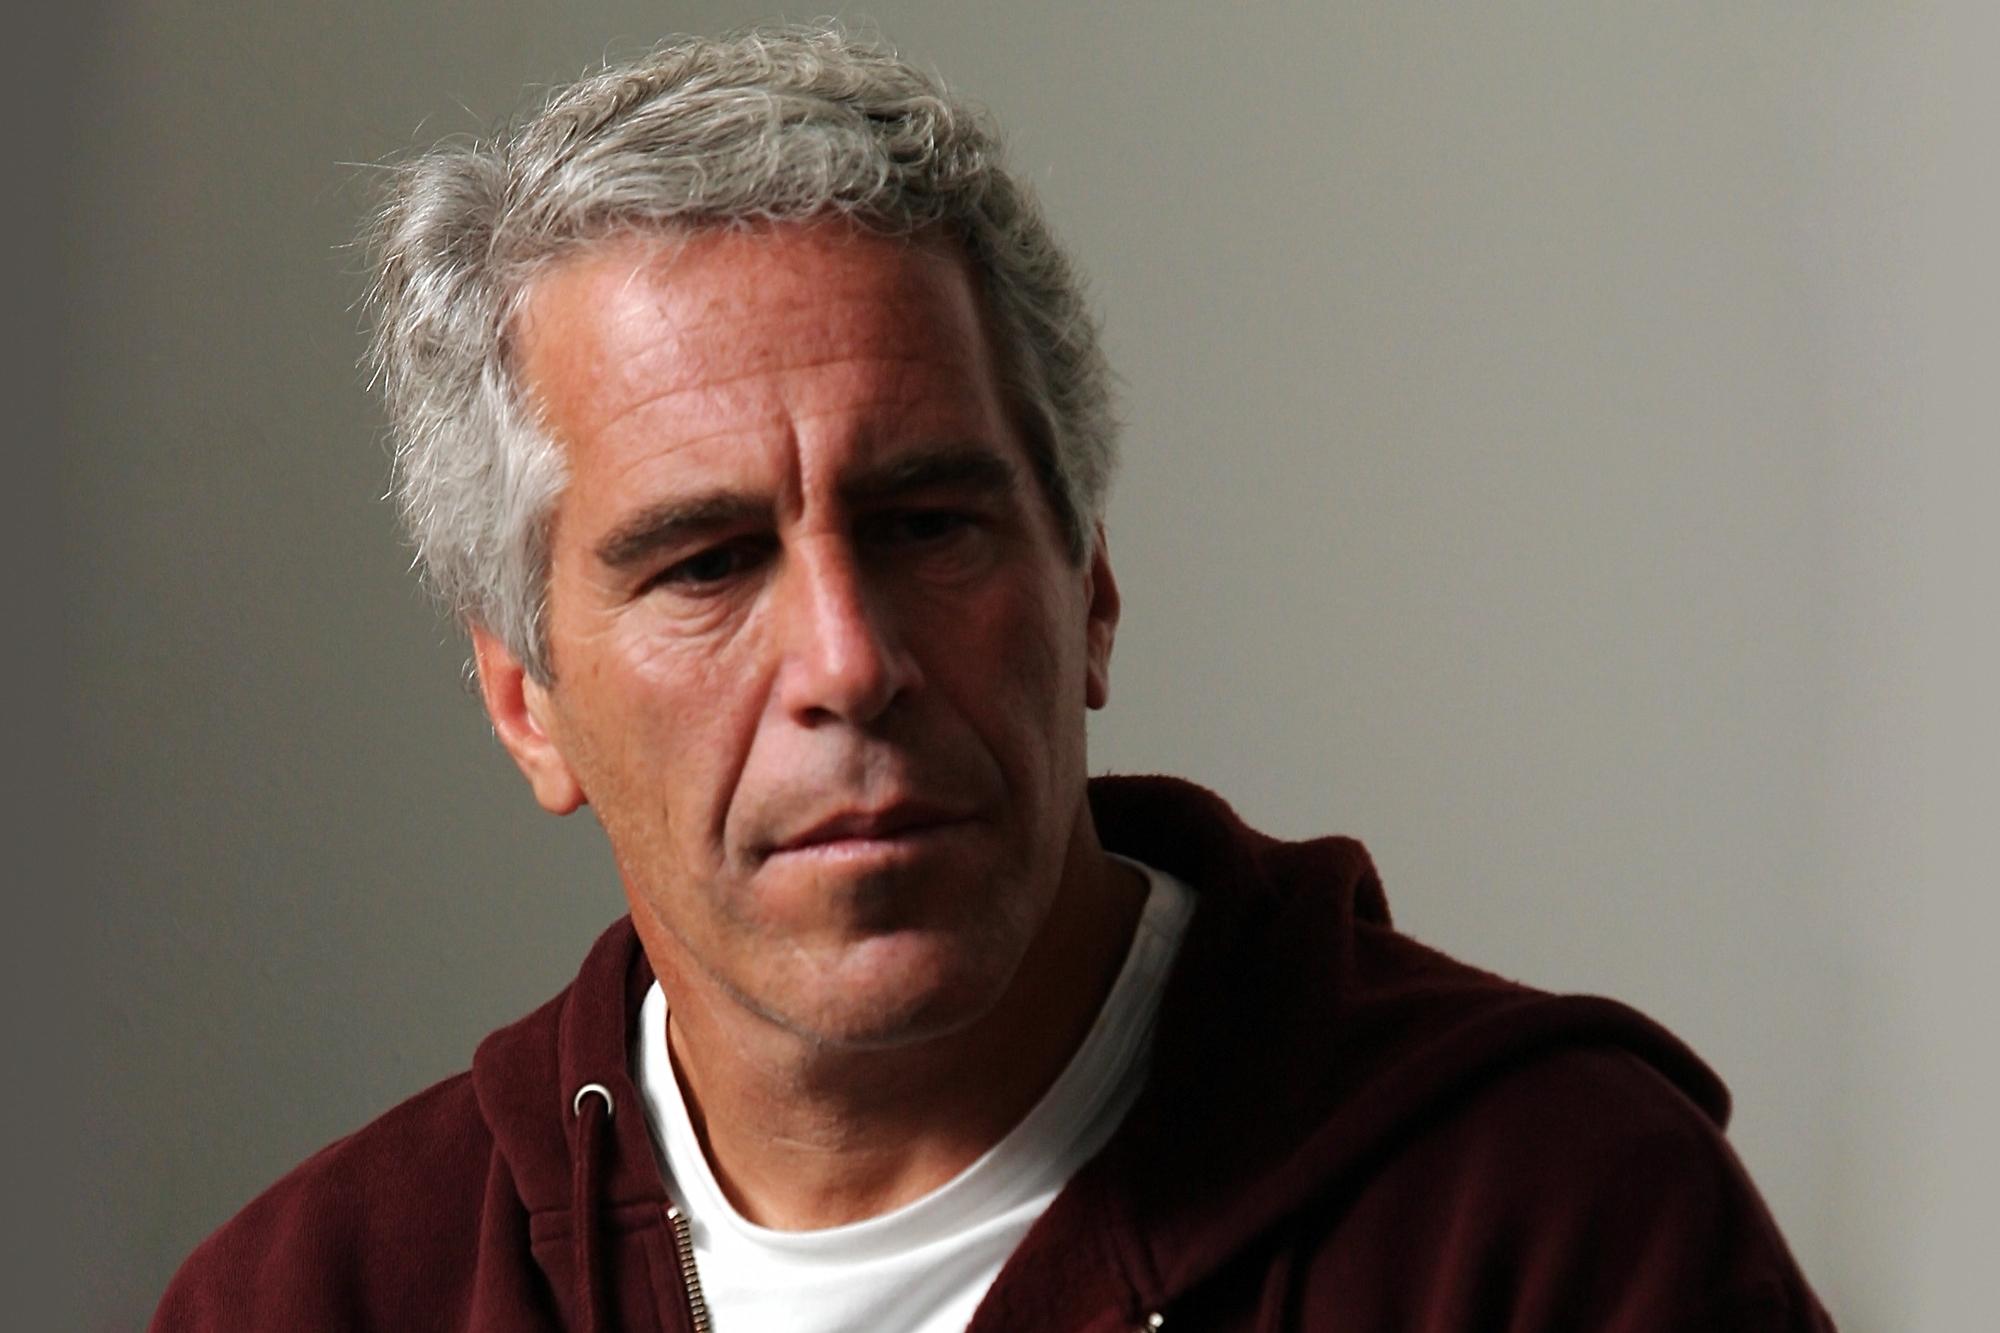 Plans Underway for Book, Movie on Disgraced Money Manager ...  |Jeffrey Epstein